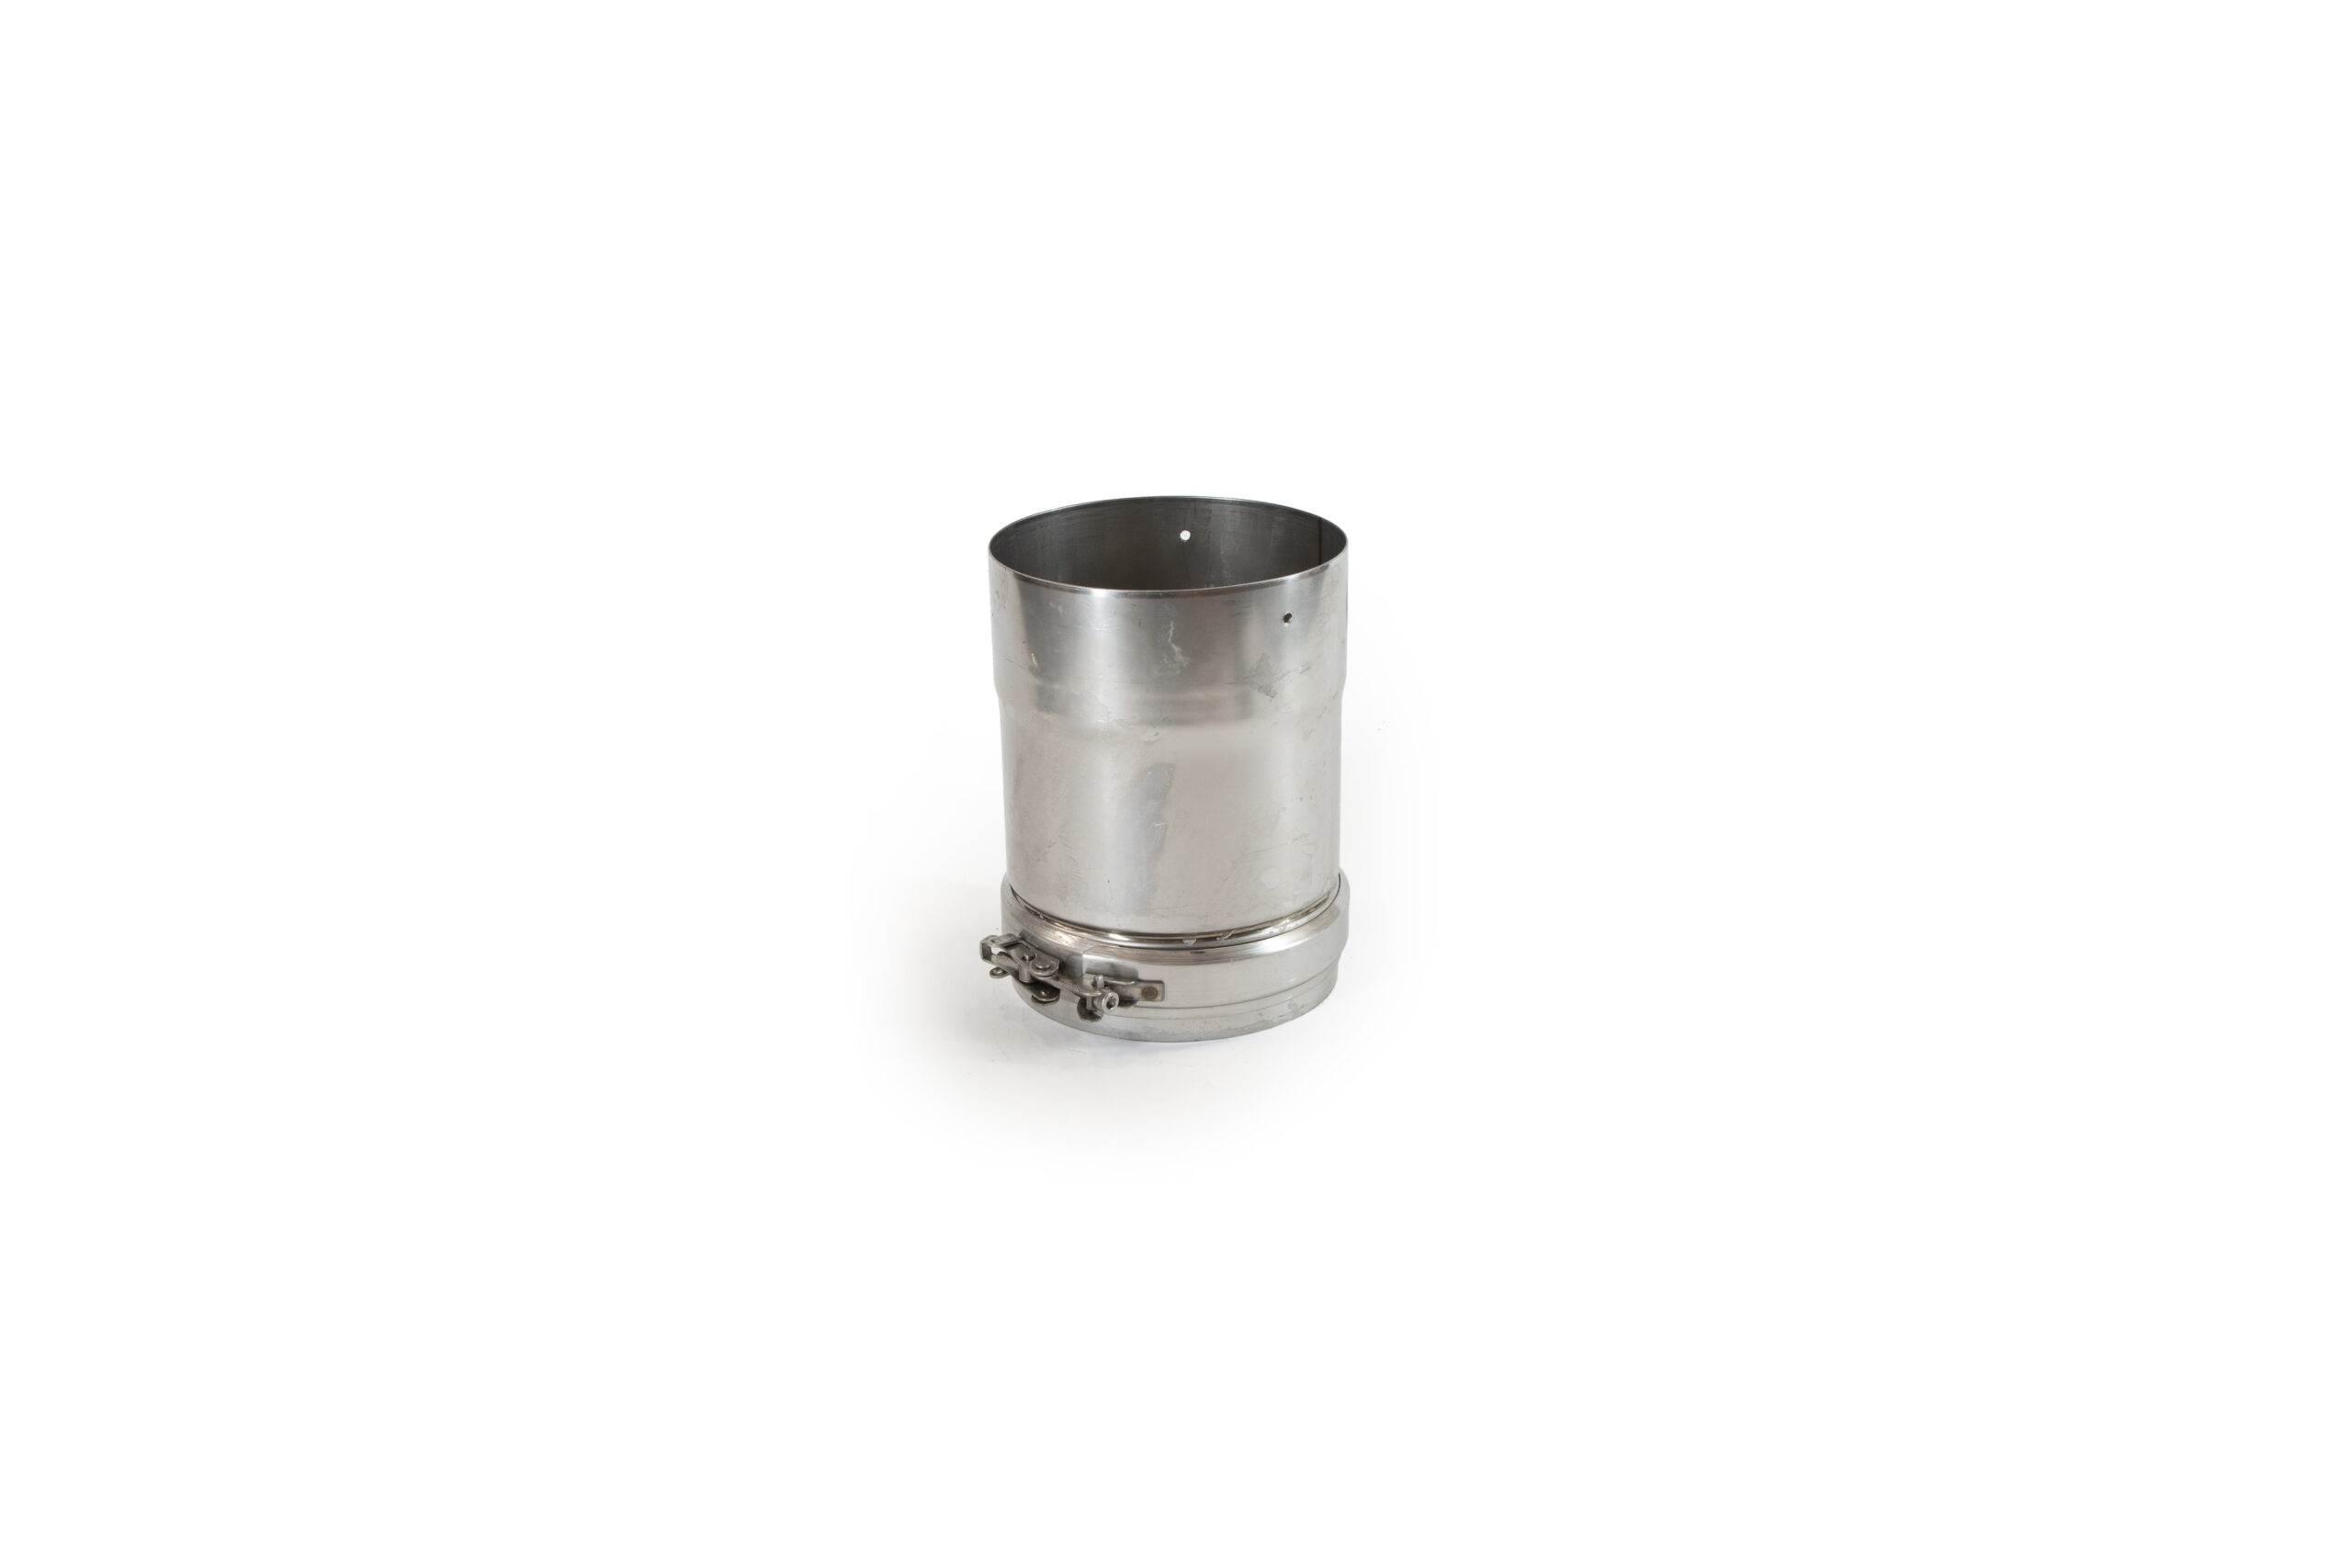 200mm Length Adjustable Stainless Steel Flue Pipe (70mm adjustment)